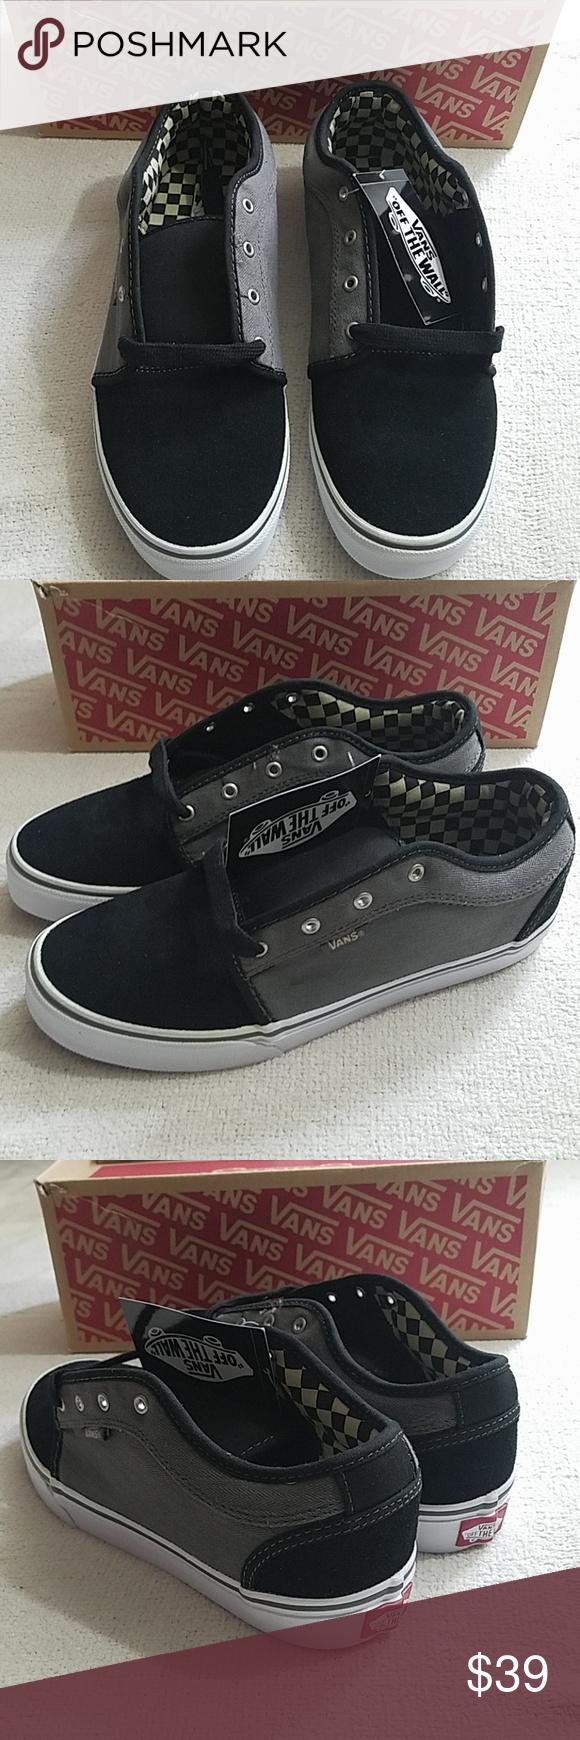 New Van s Chukka Low Black pewter shoes Van s with box size youth 6.0 Herringbone  black ca2f4a924